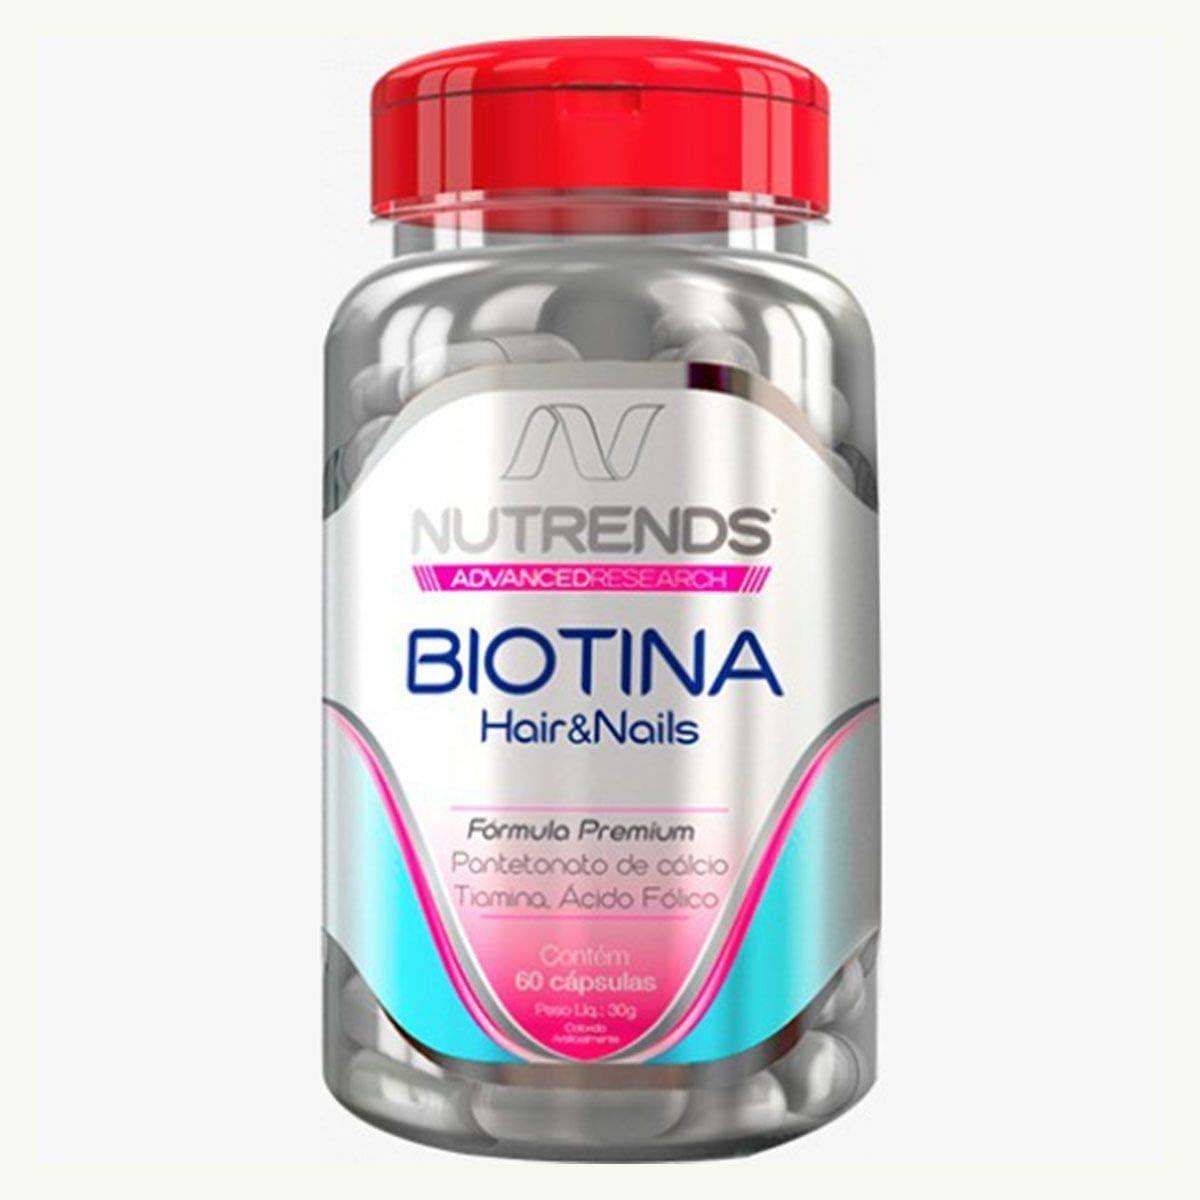 Biotina Hair&Nails 450mg 60 cápsulas, Nutrends